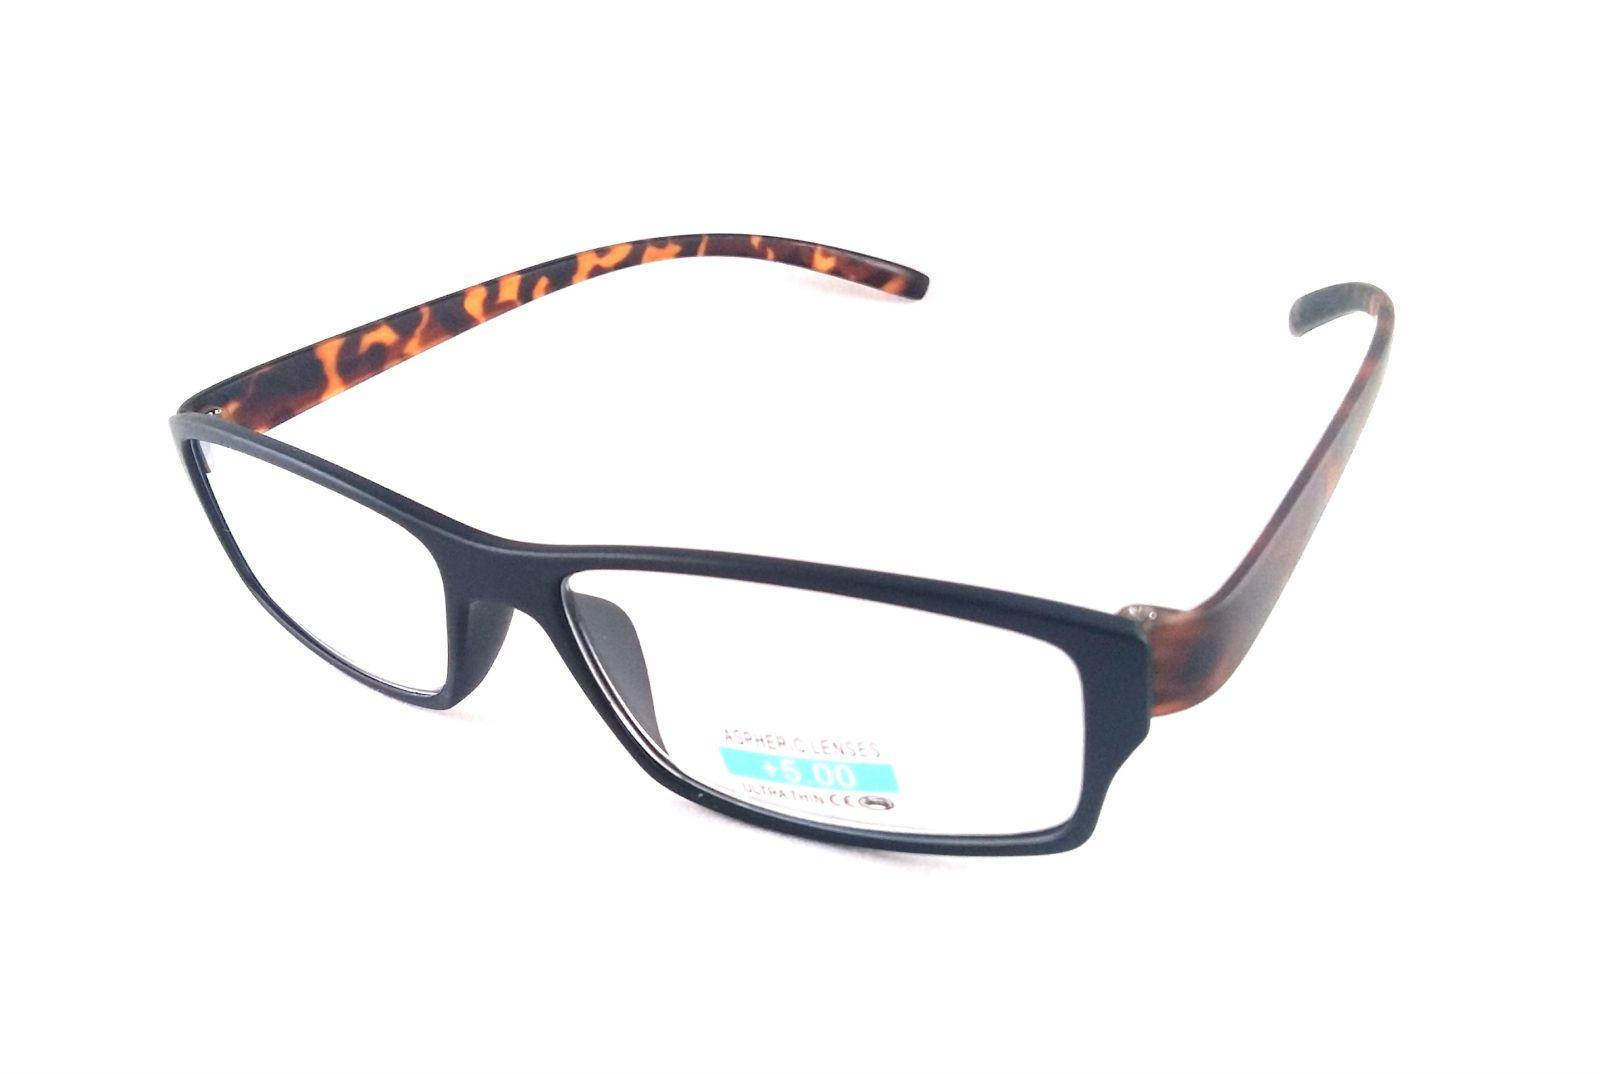 Dioptrické brýle P2.03/ +5,00 hnědá nožička